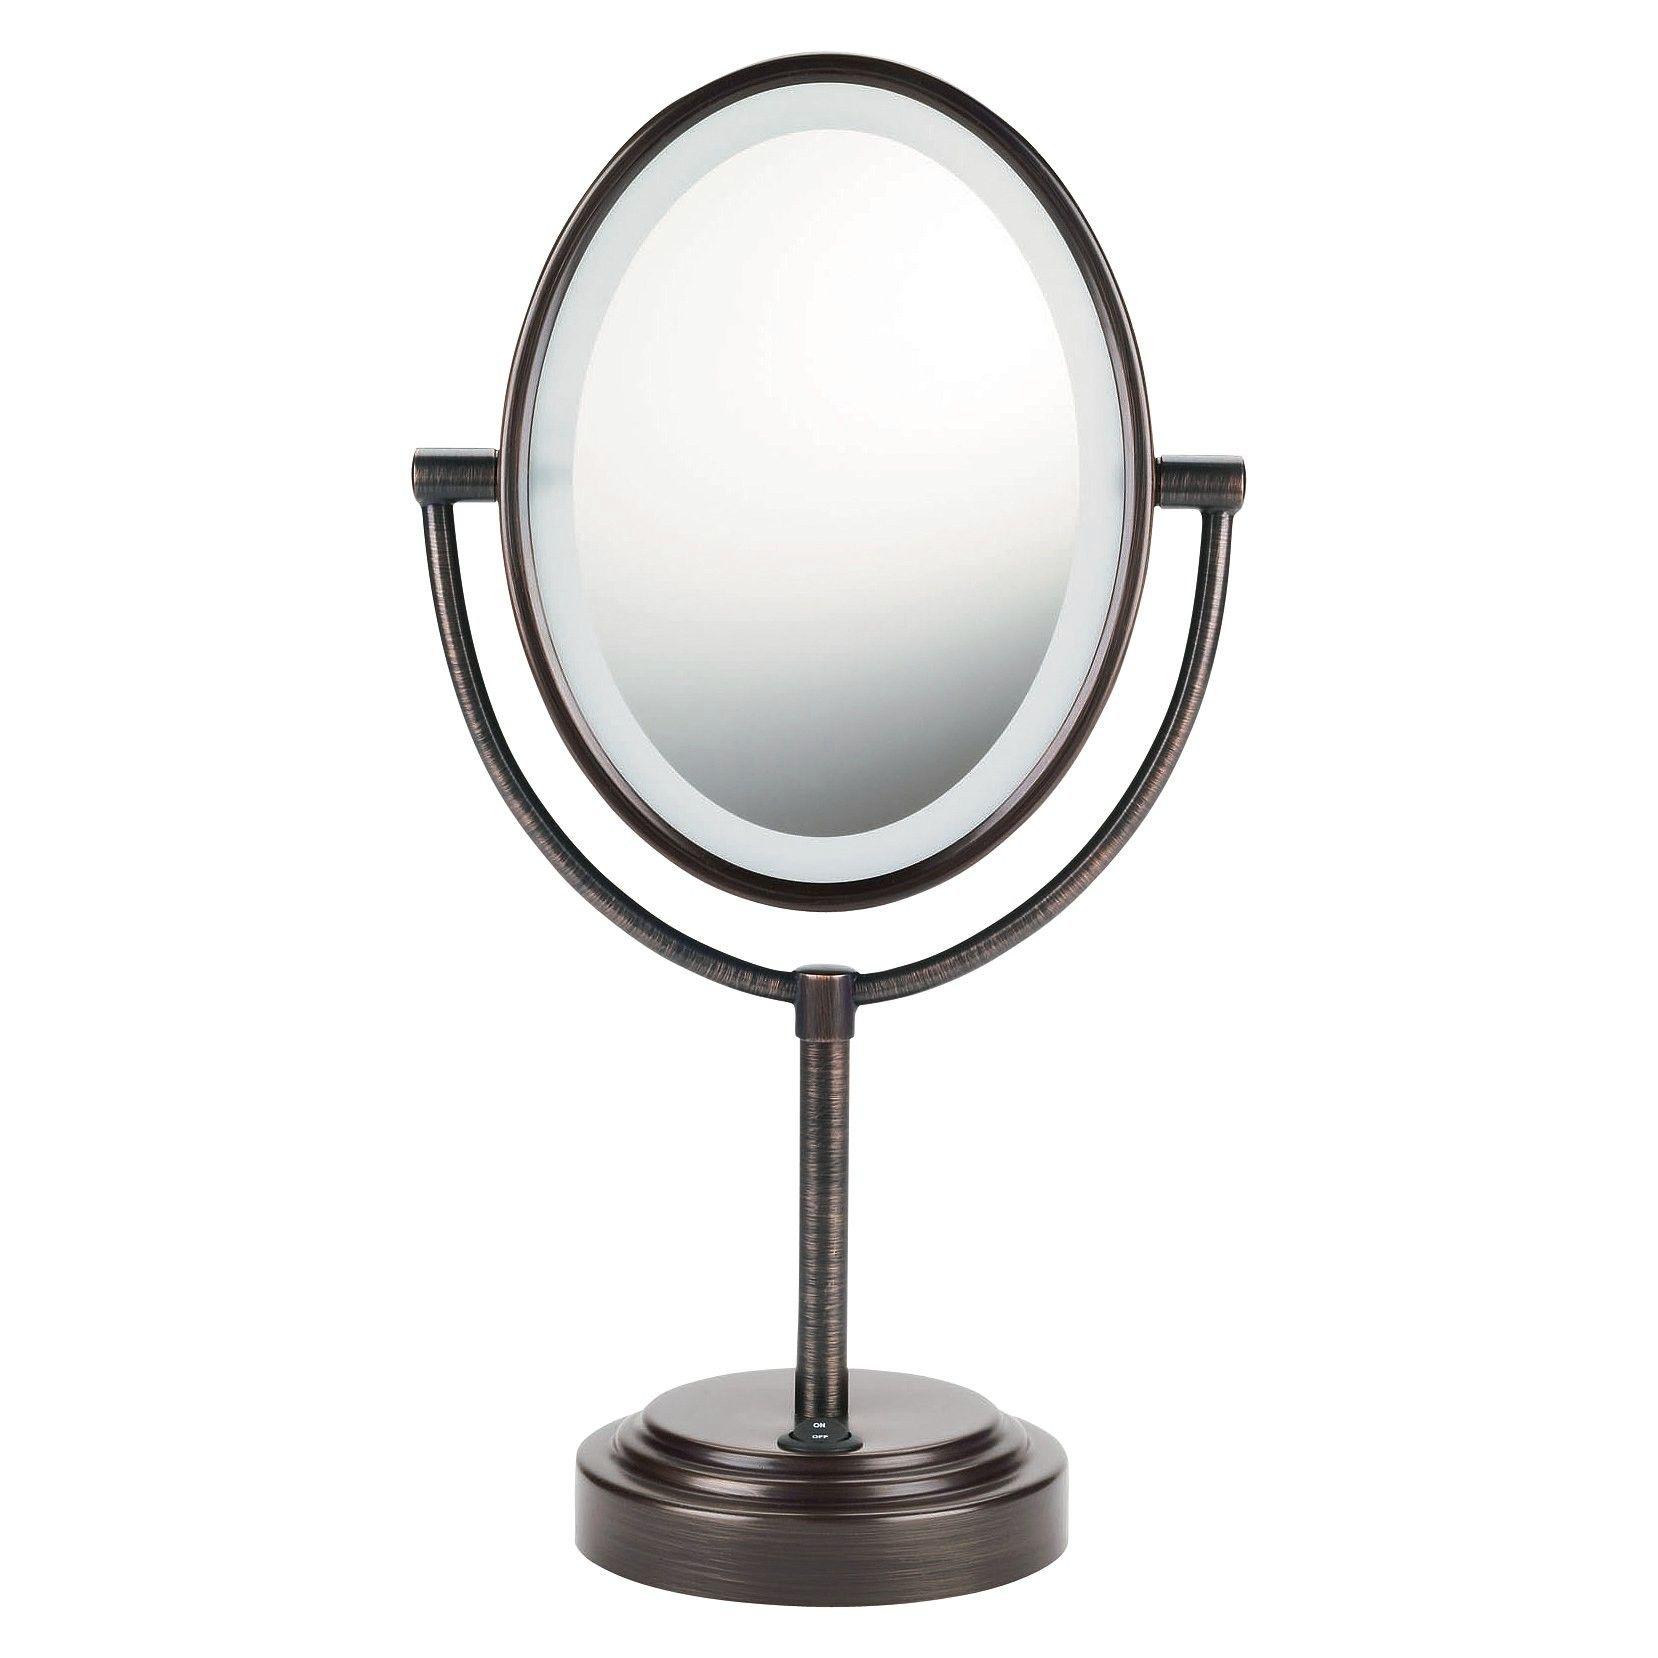 Conair Oiled Bronze Double Sided Oval Illuminate Target